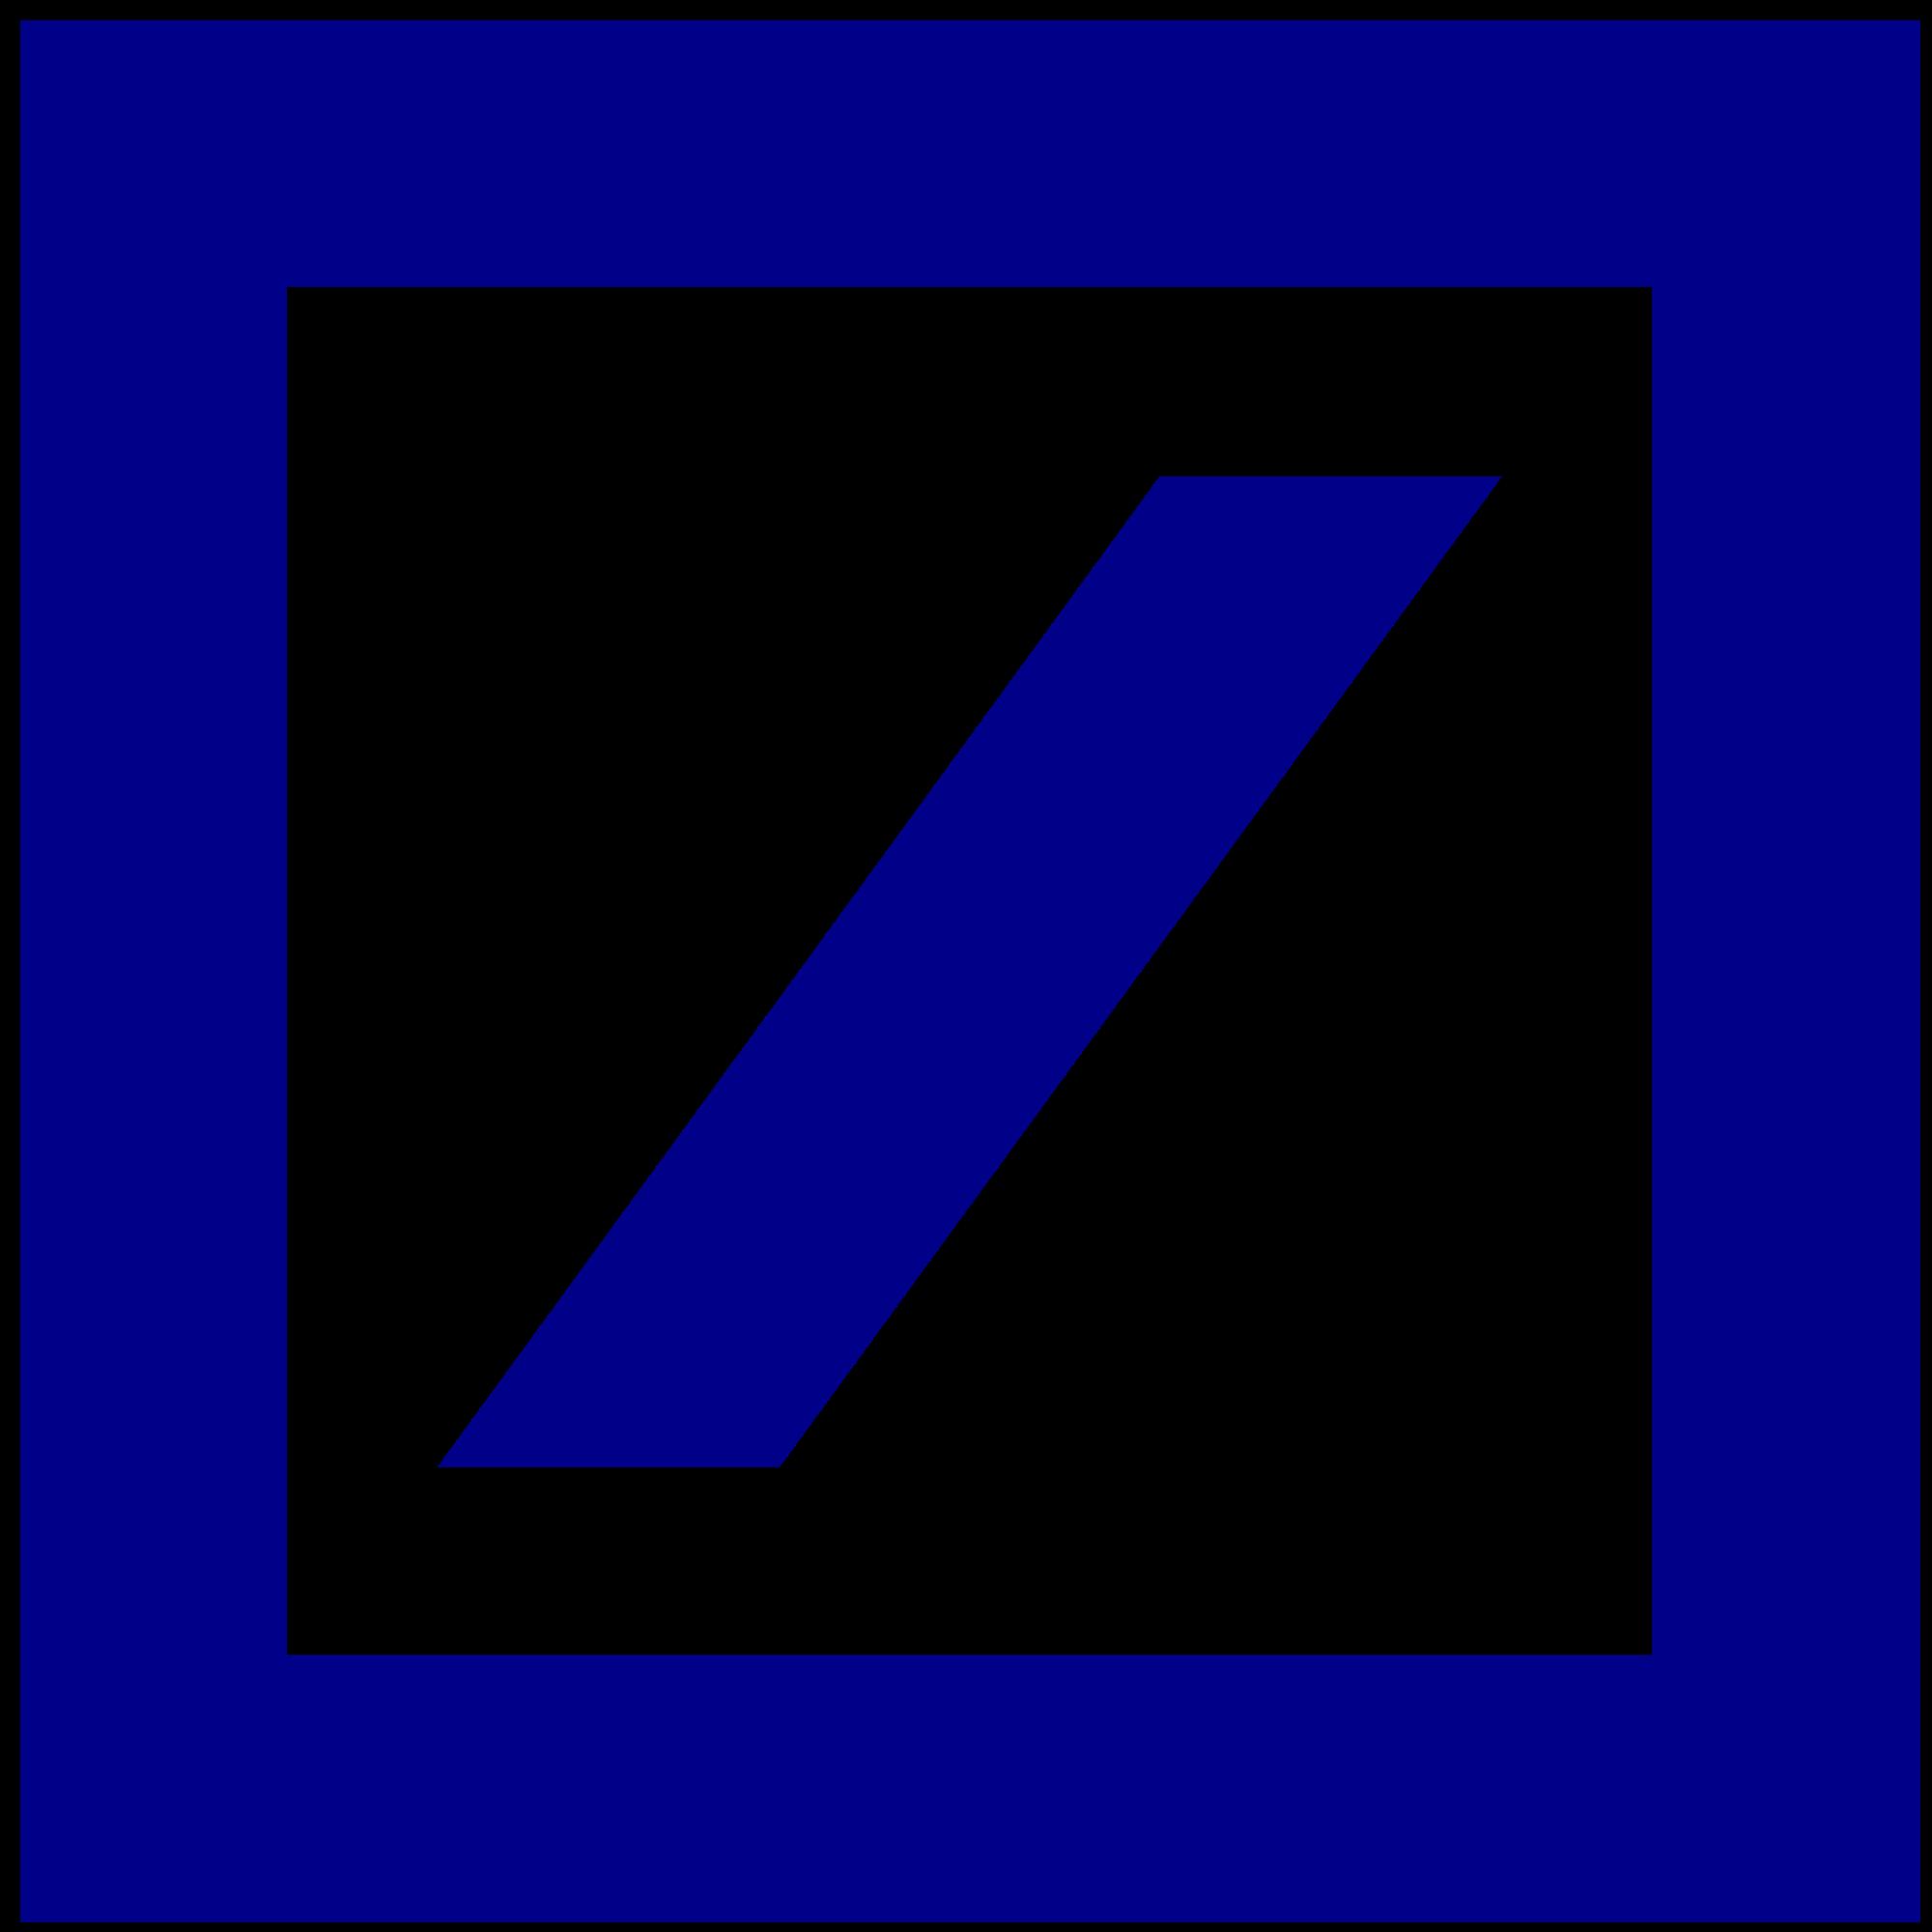 bank logos - photo #24